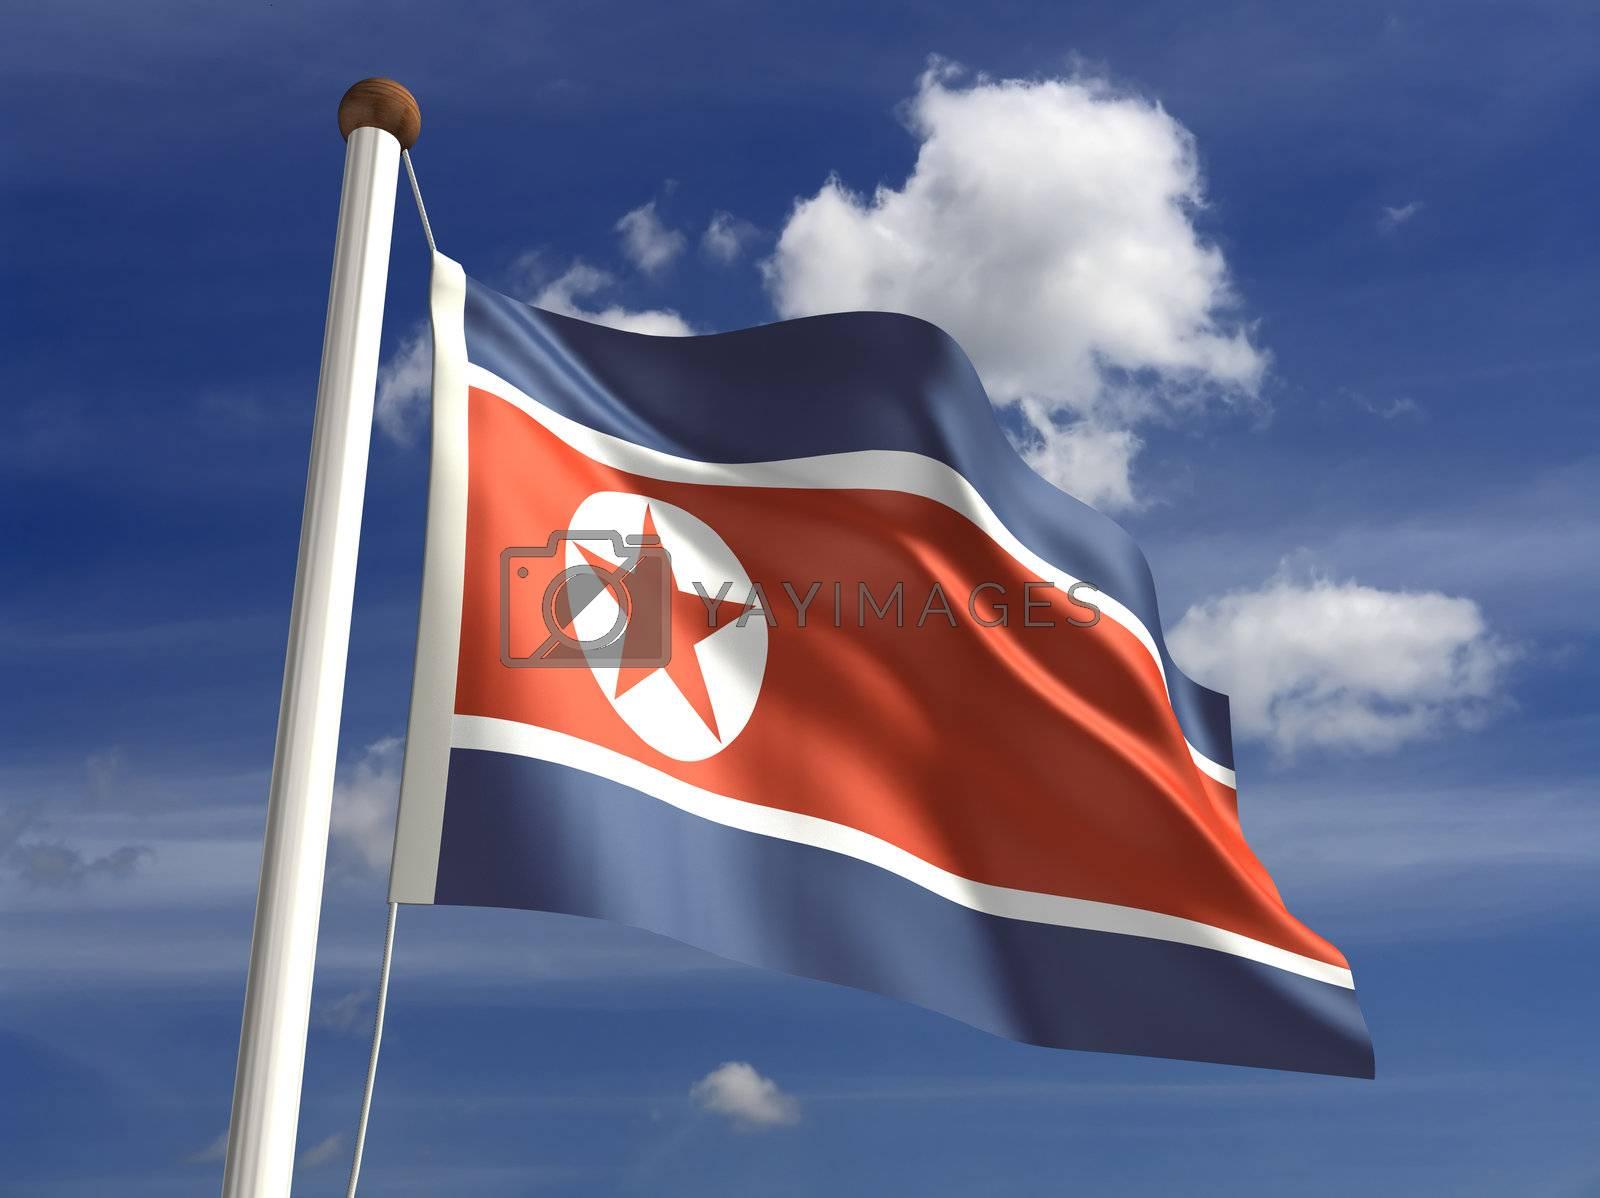 North Korea flag by selensergen